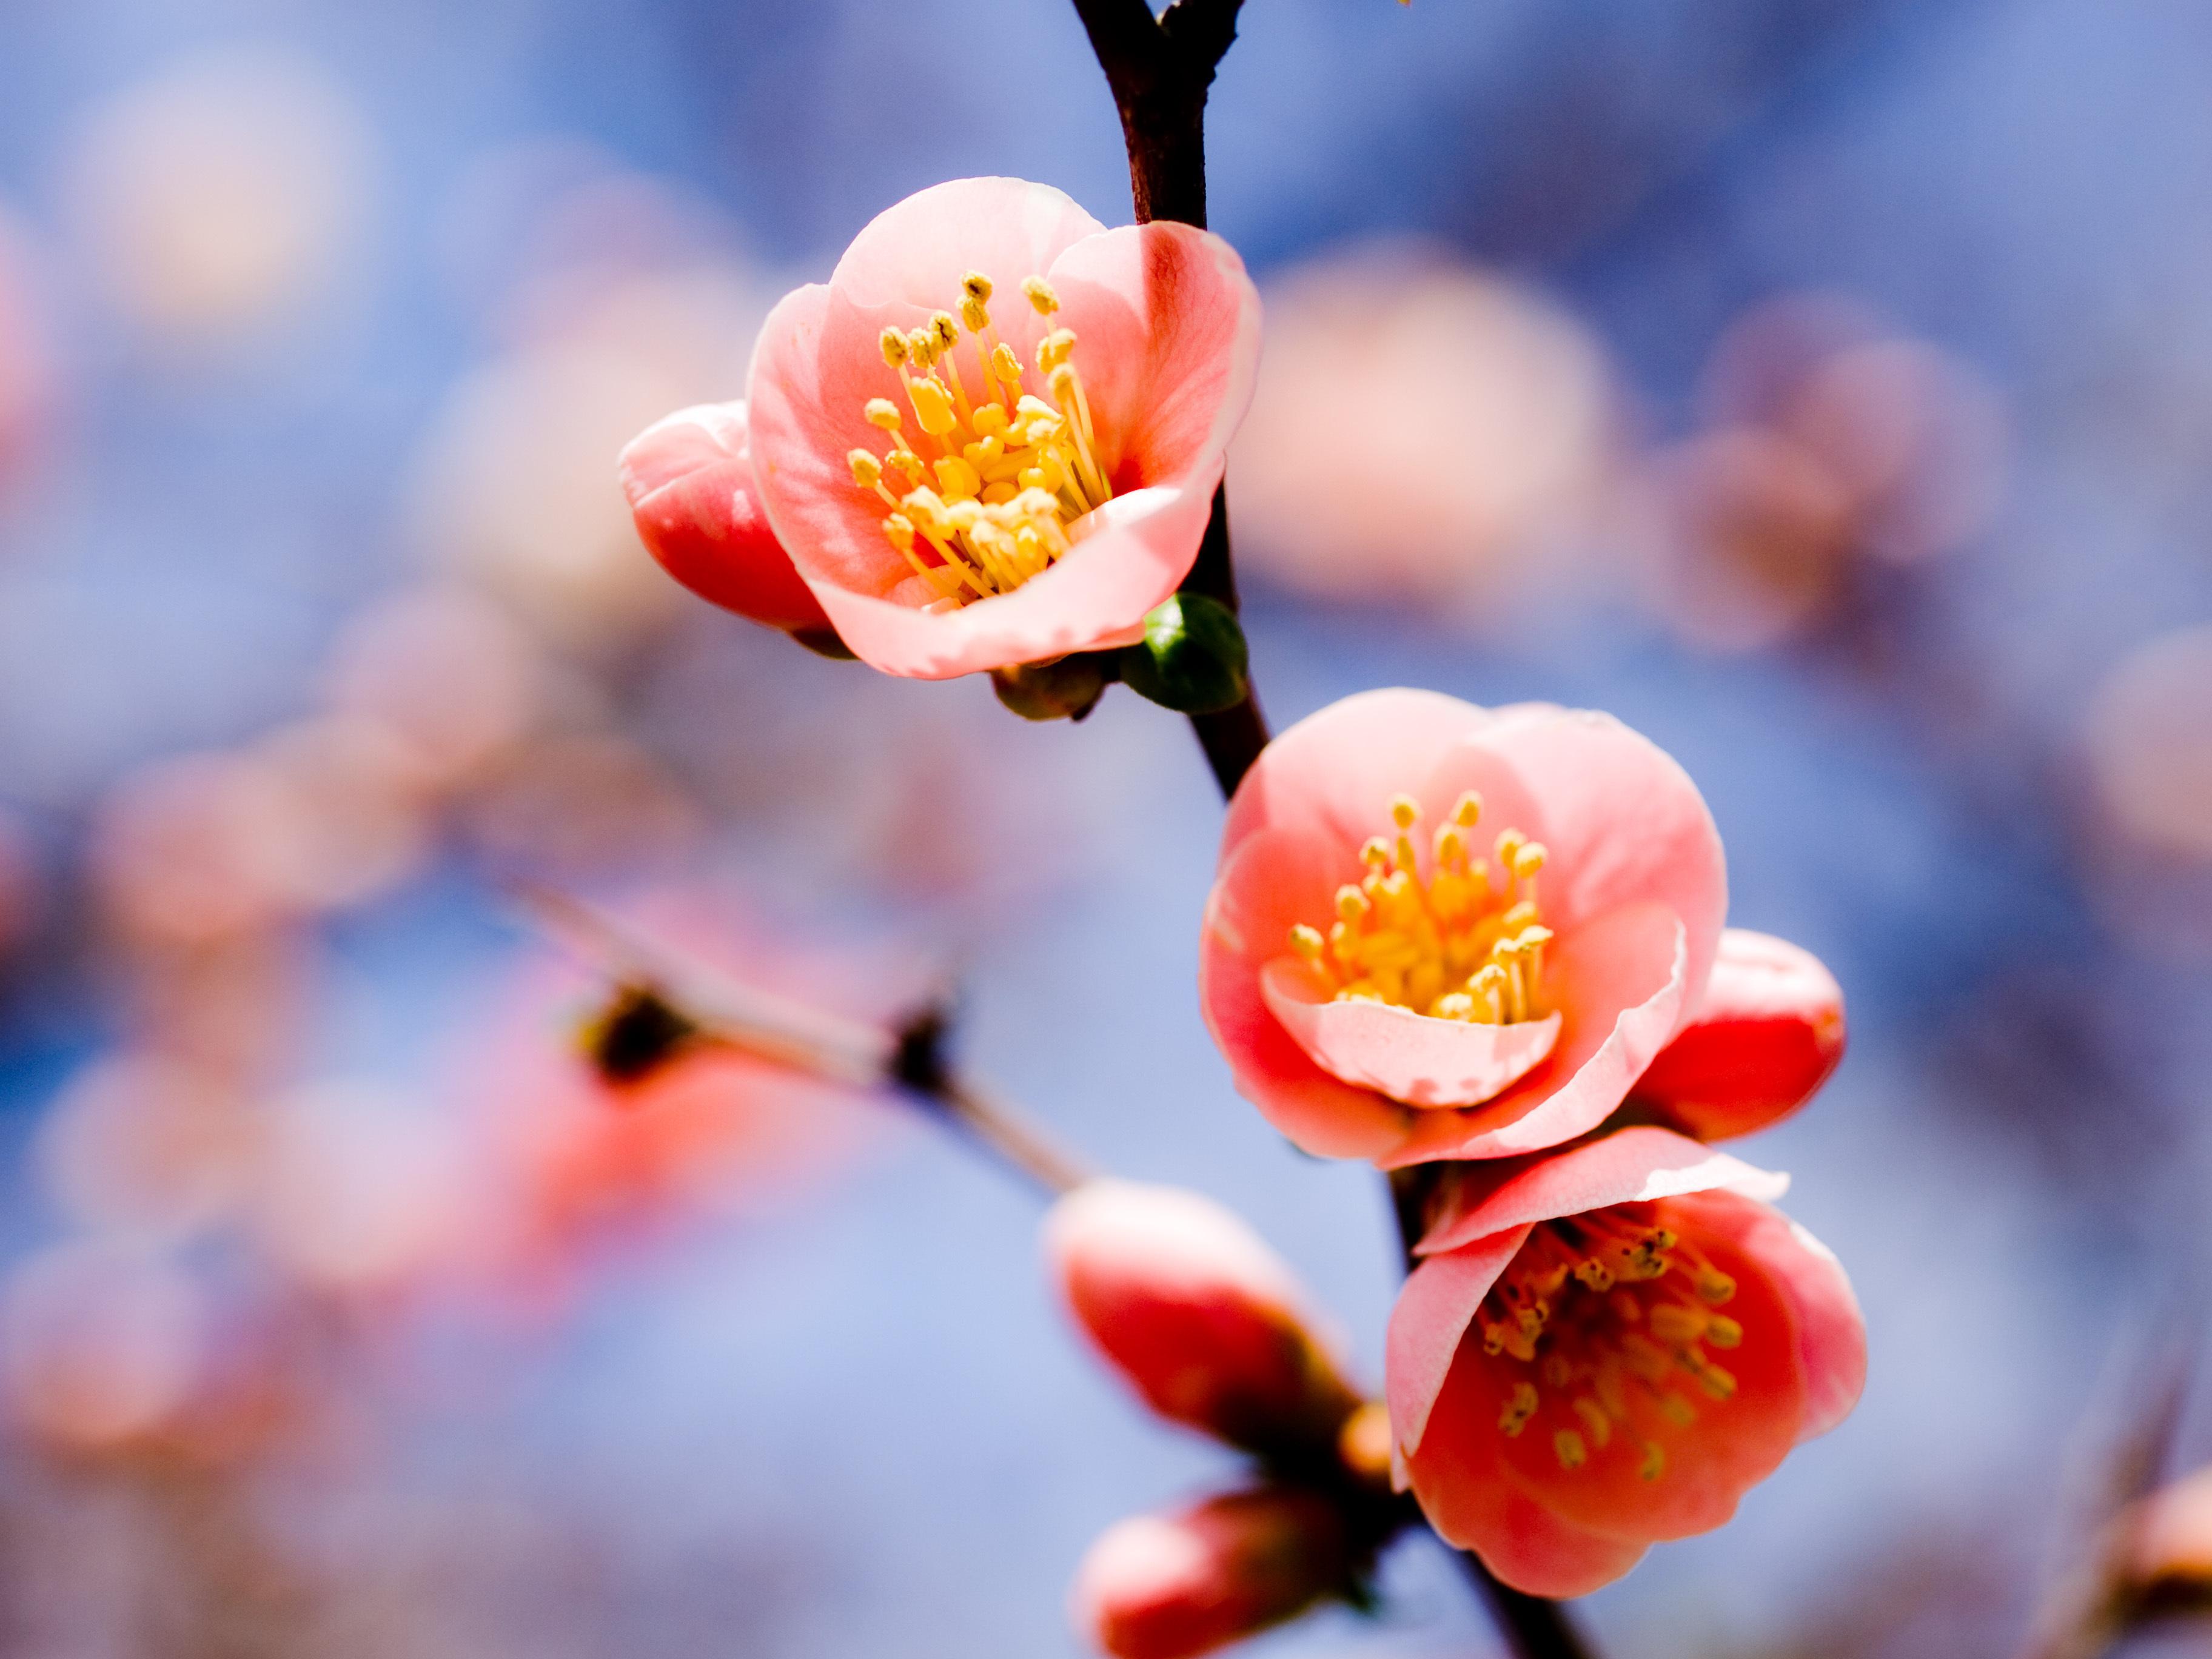 Цветочки весенние картинки передачи том